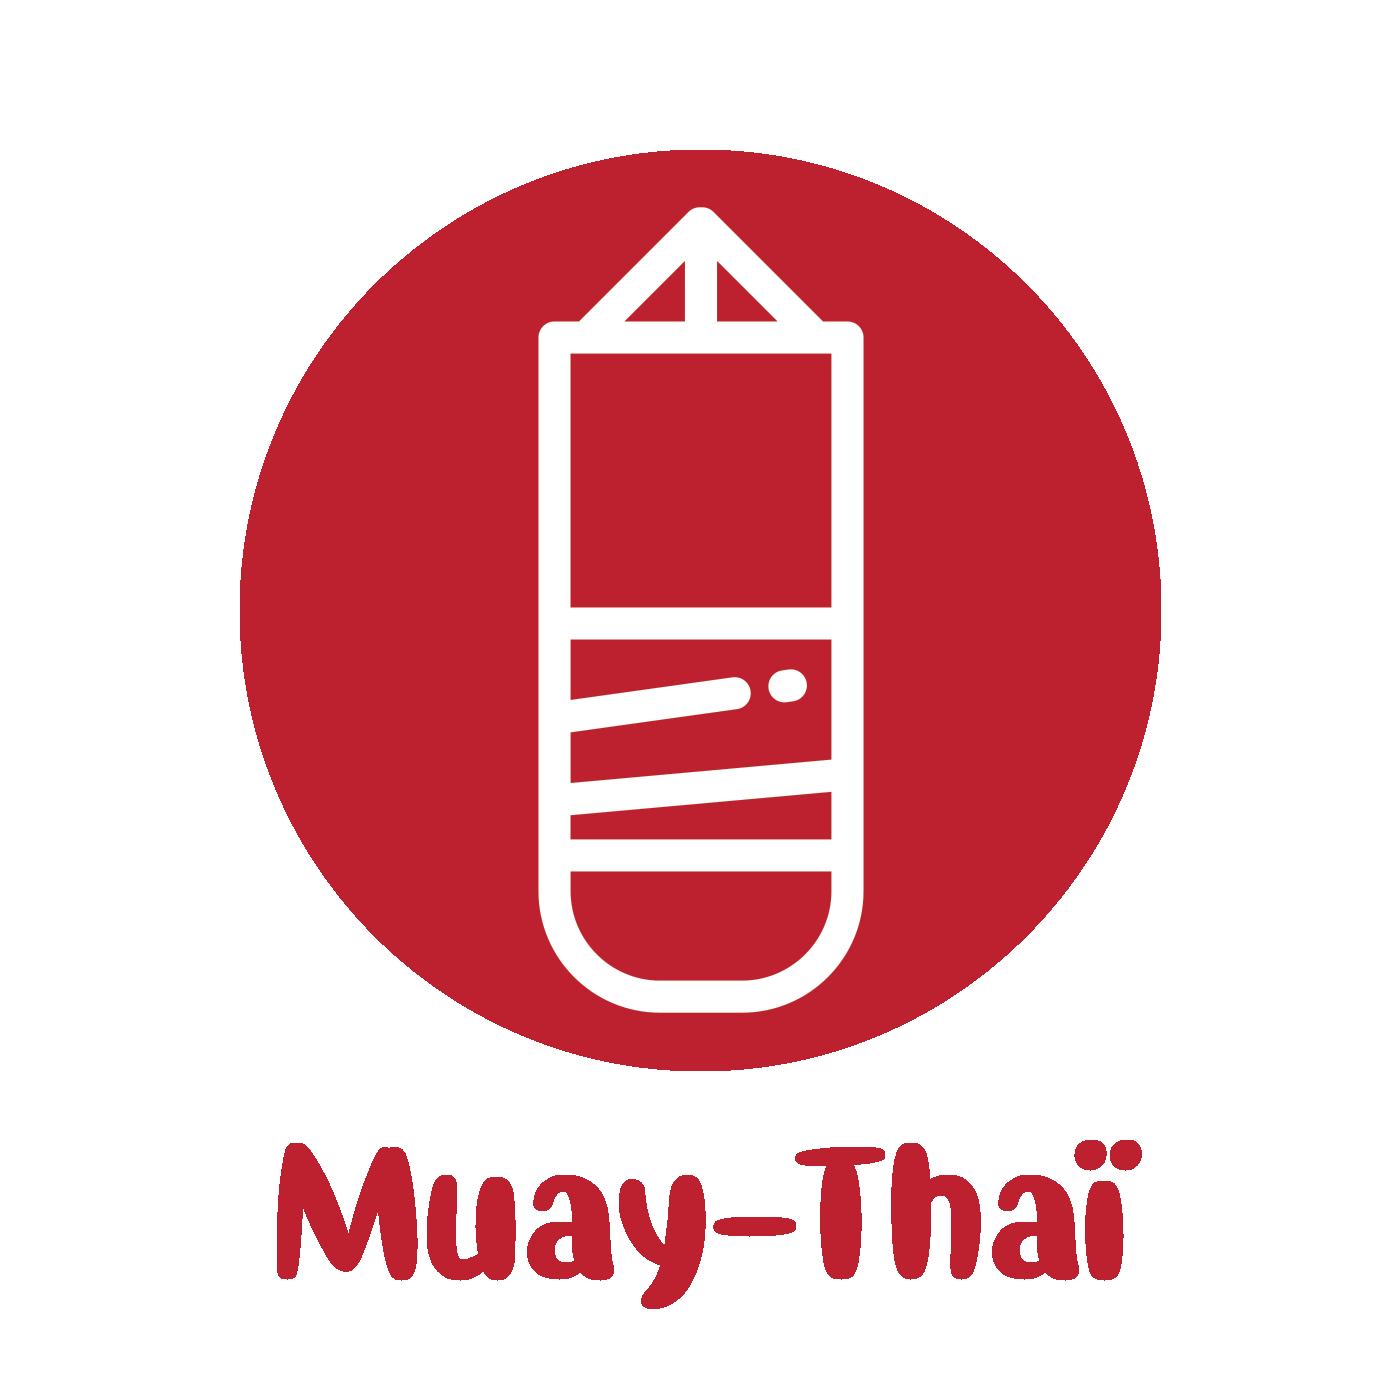 Muay-Thaï